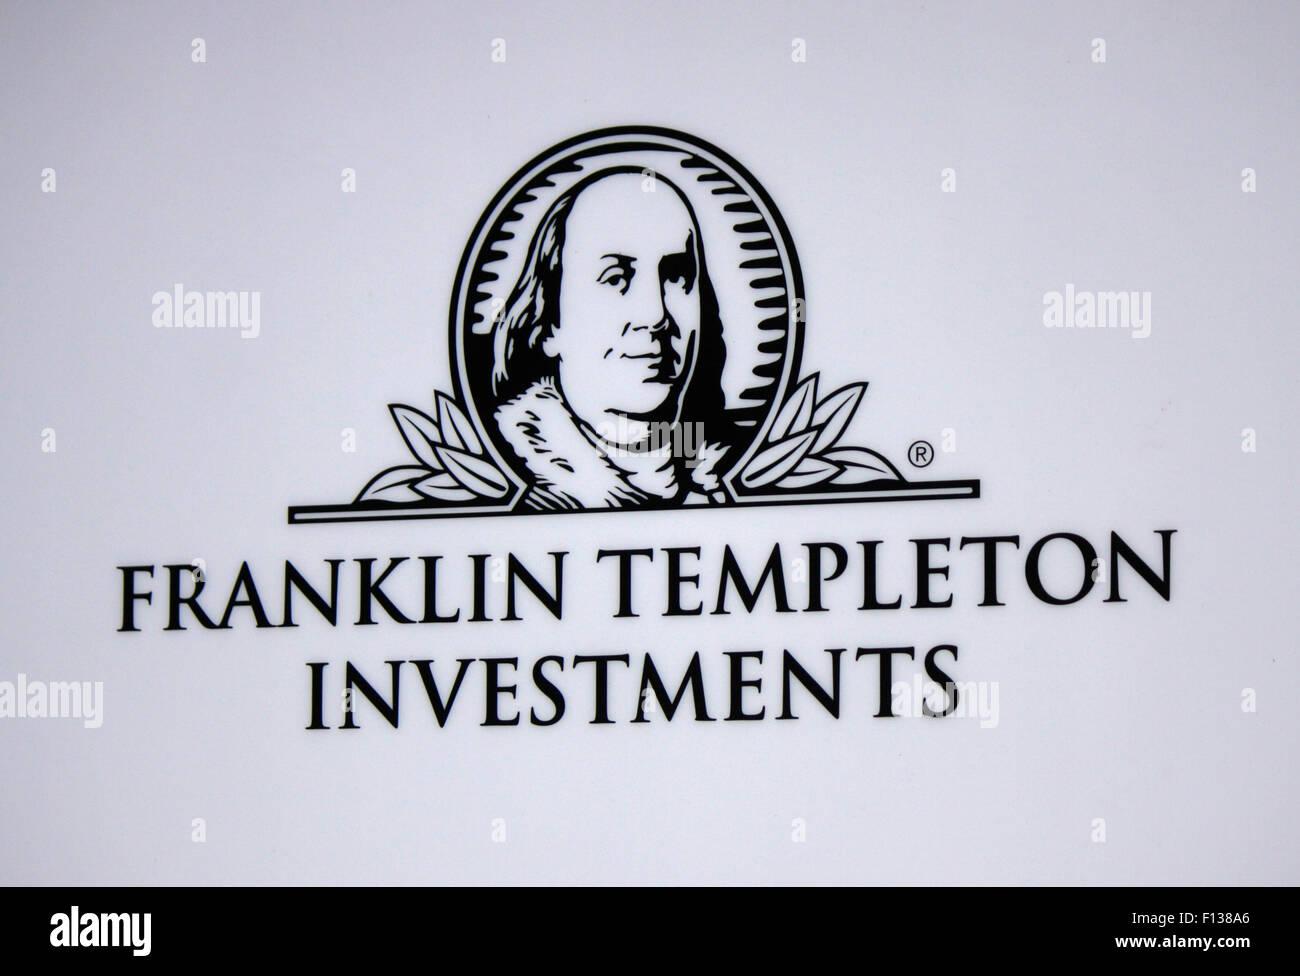 Markennamen: 'Franklin Templeton Investments', Frankfurt am Main. - Stock Image